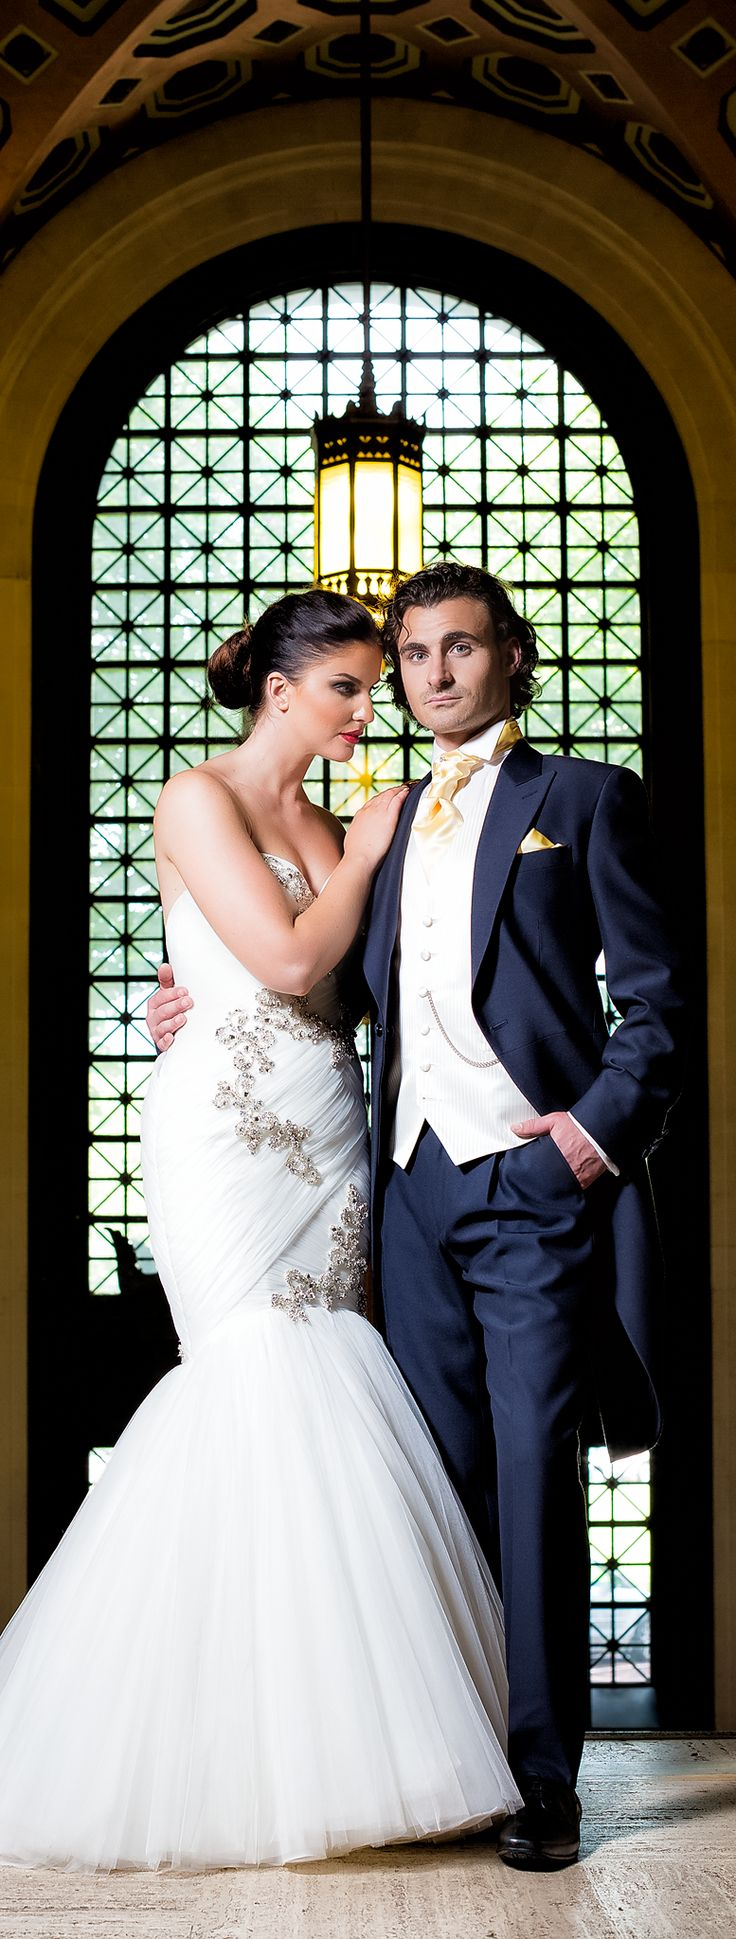 12 best New Brochure Preview images on Pinterest | Brochures, Suit ...